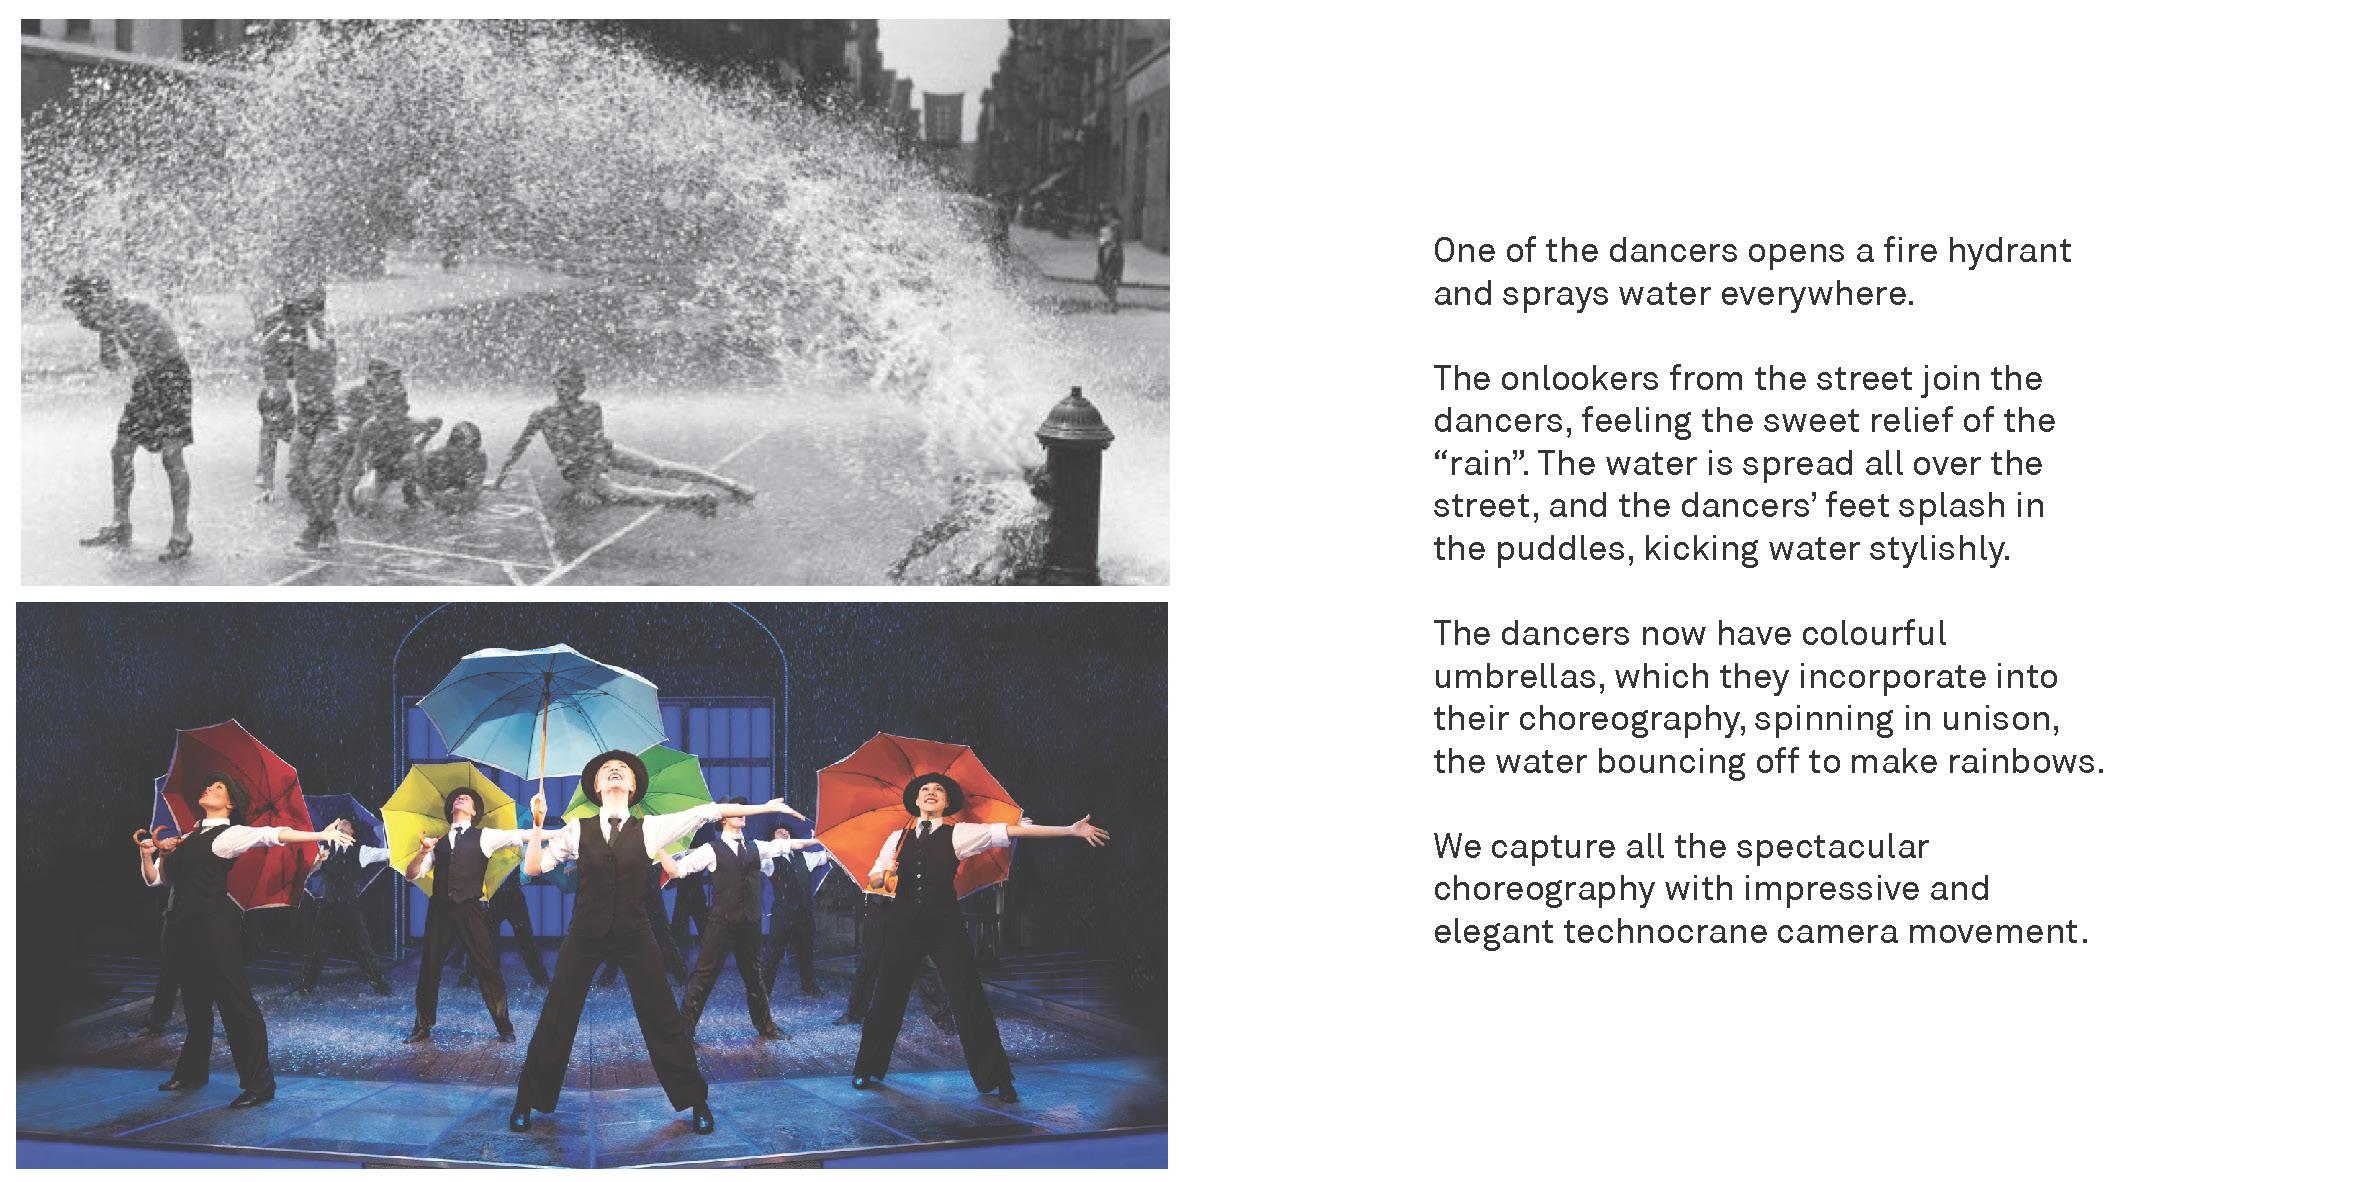 MIKA - ICE CREAM v6_Page_10.jpg